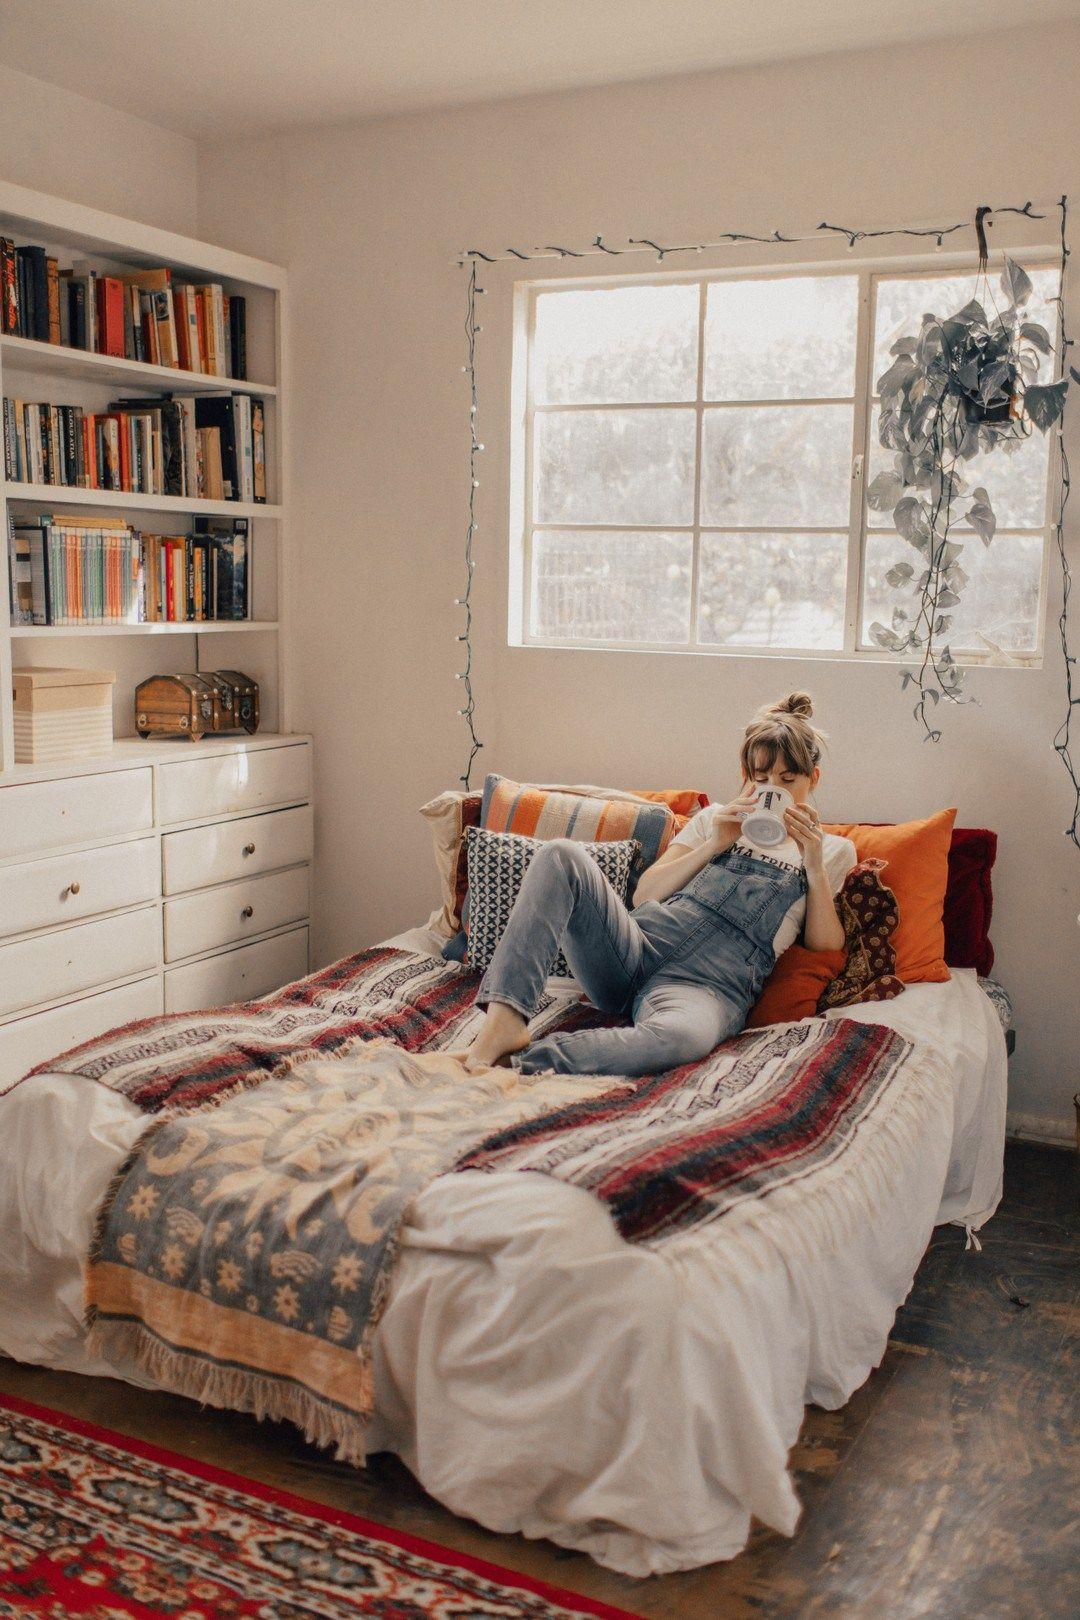 99 Elegant Cozy Bedroom Ideas With Small Spaces 6 Home Bedroom Bedroom Inspirations Bedroom Decor